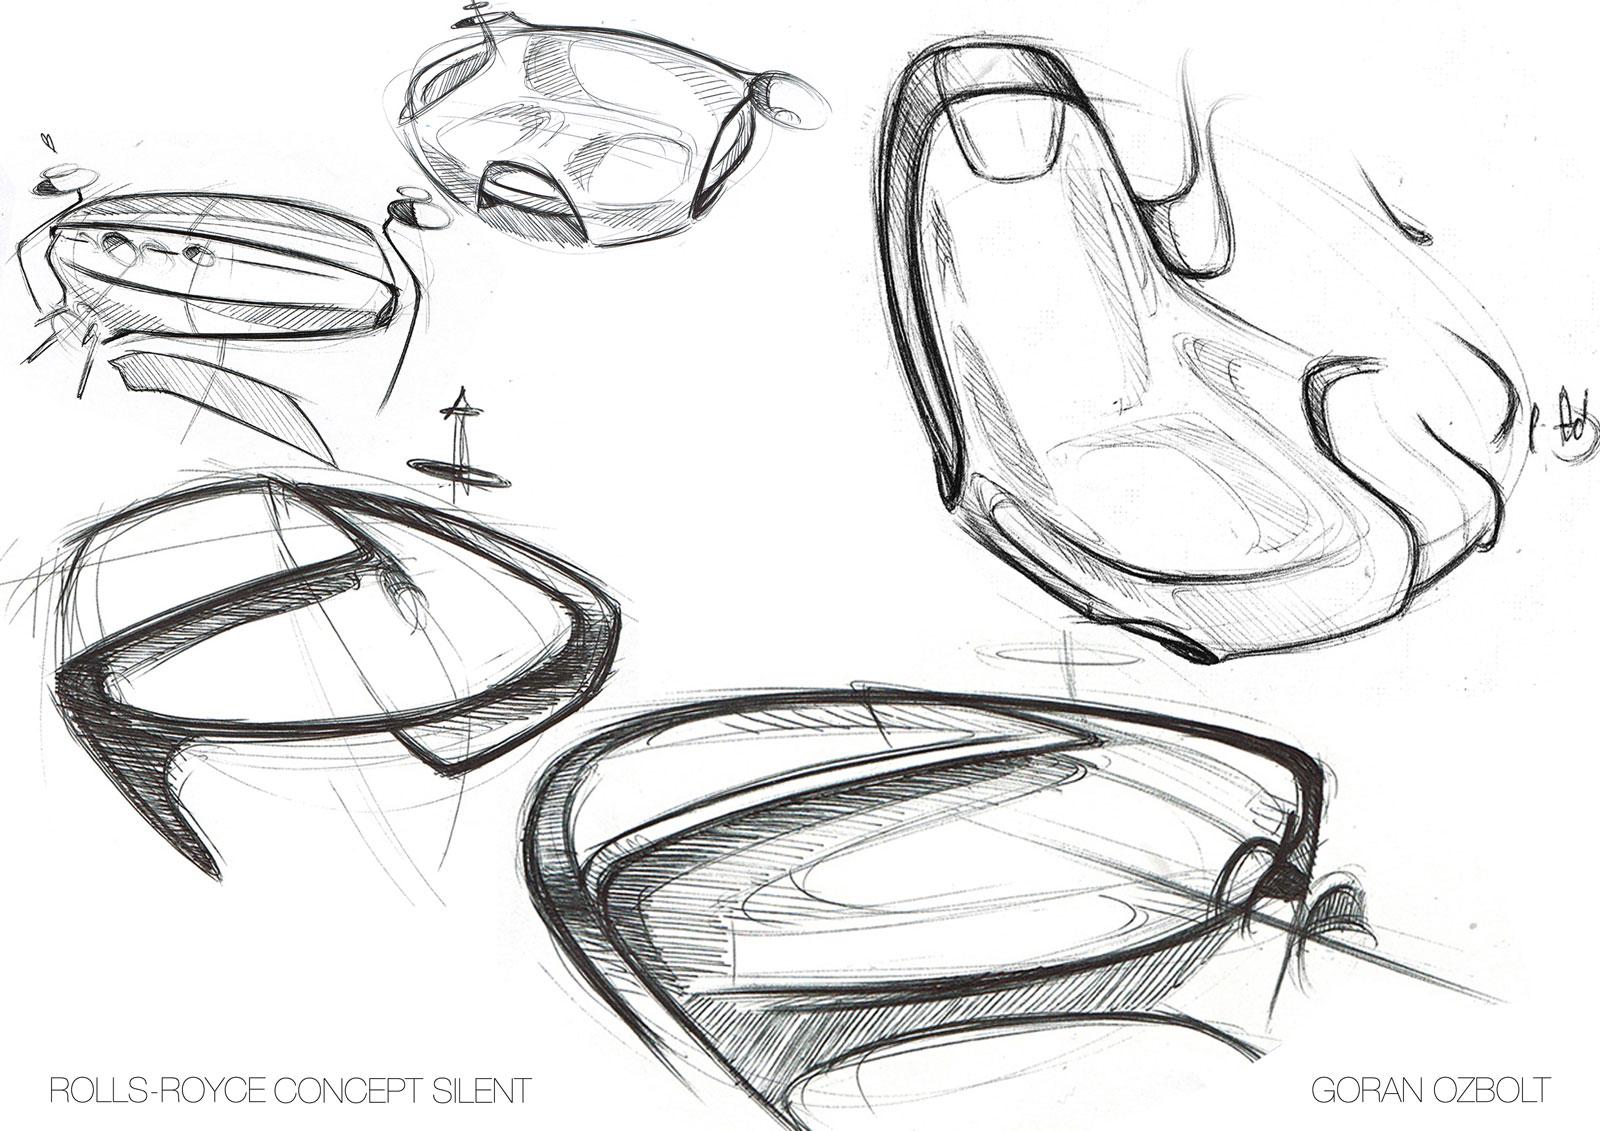 1600x1131 rolls royce concept silent by goran ozbolt